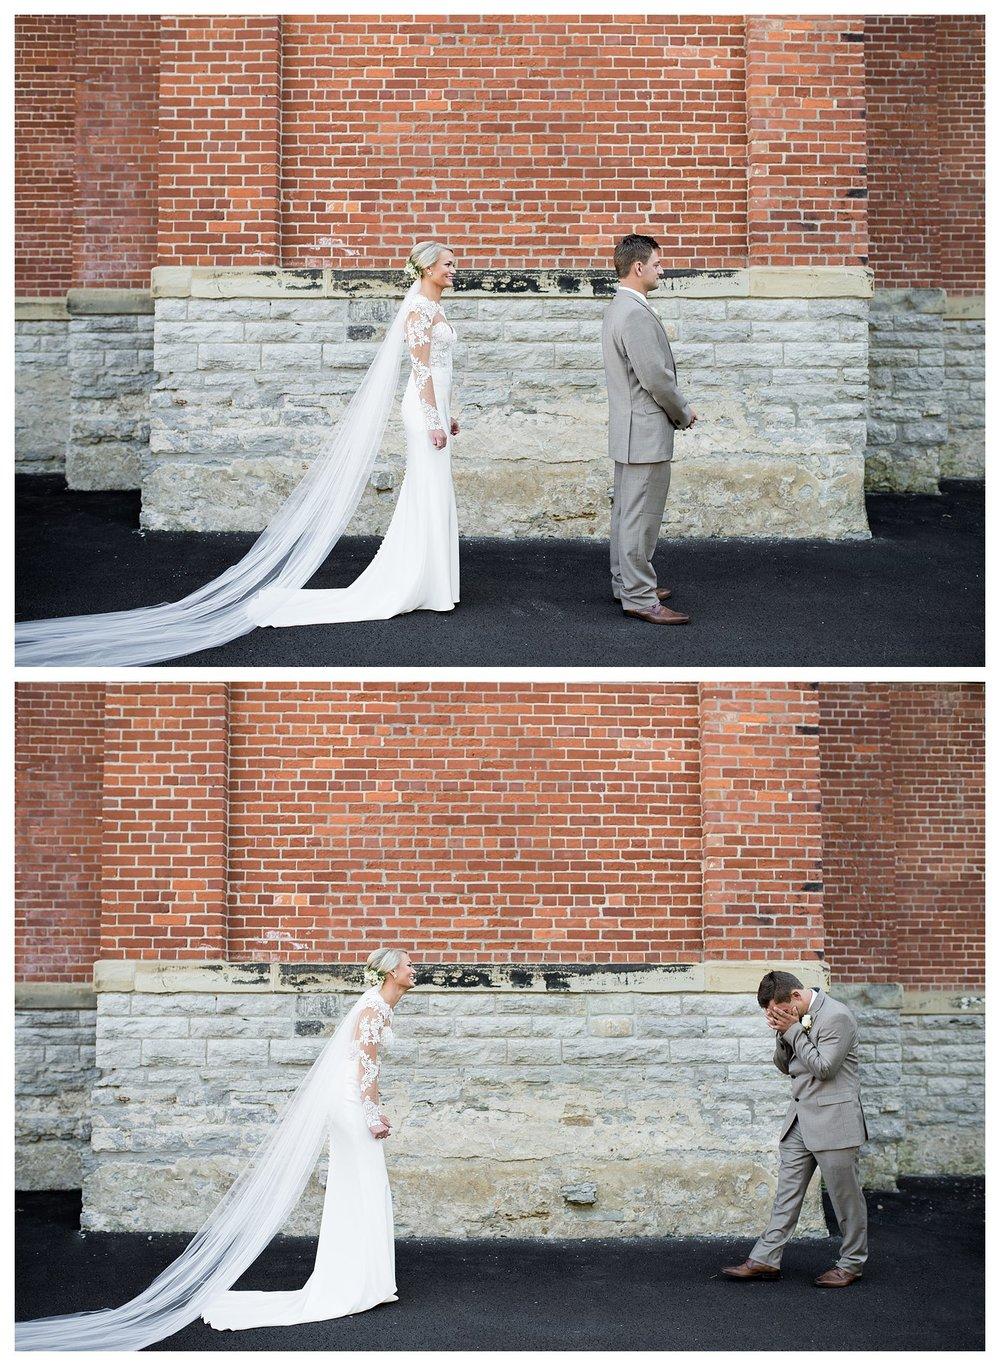 everleigh-photography-monastery-event-center-cincinnati-wedding-photographer-tara-and-elliot-heil-wedding-19